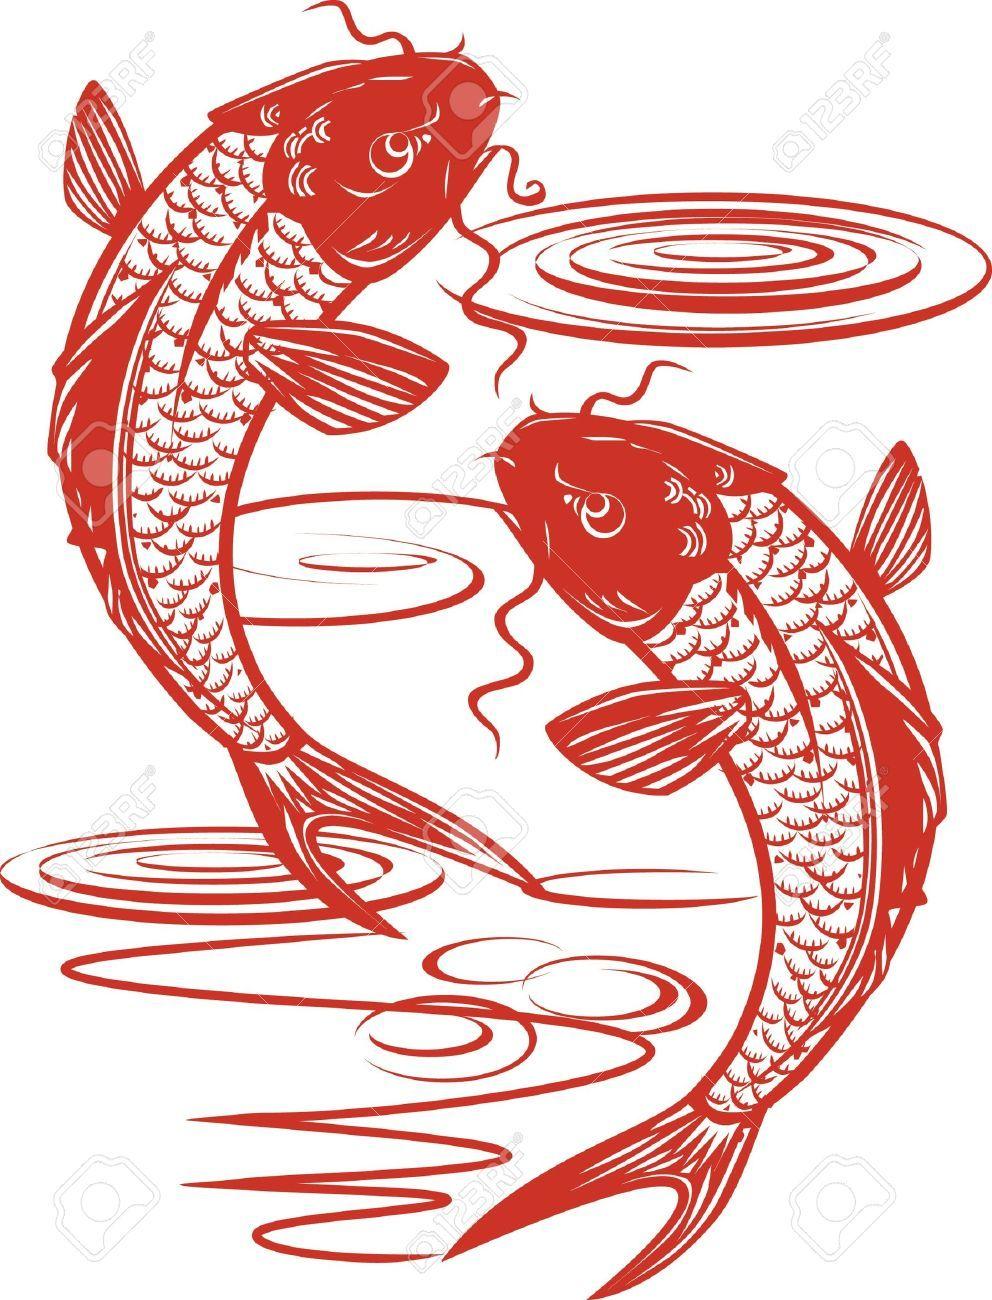 Koi Fish Stock Vector Illustration And Royalty Free Koi Fish Clipart.